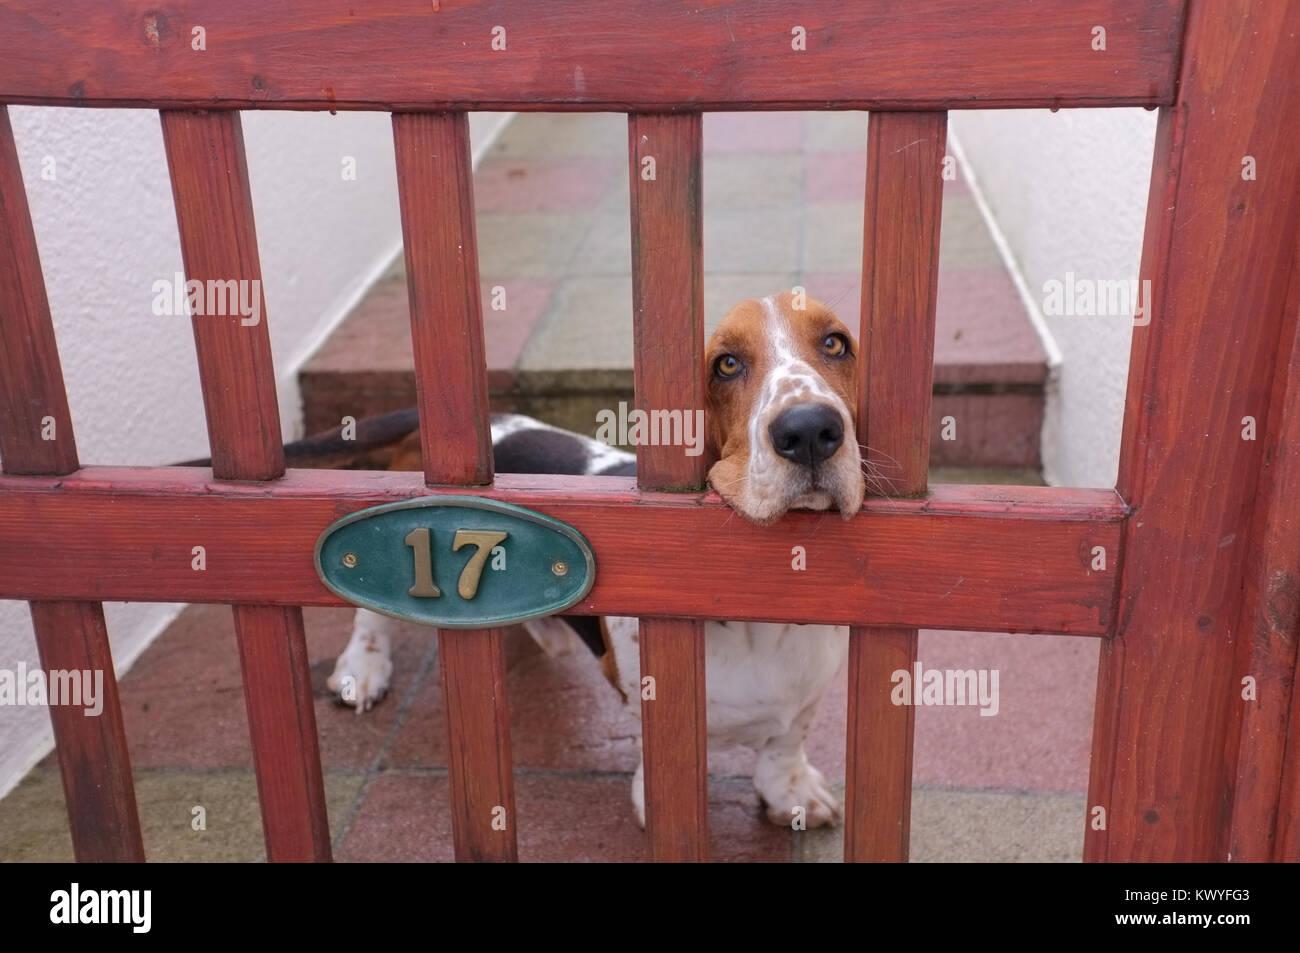 Basset Hound at gate. - Stock Image